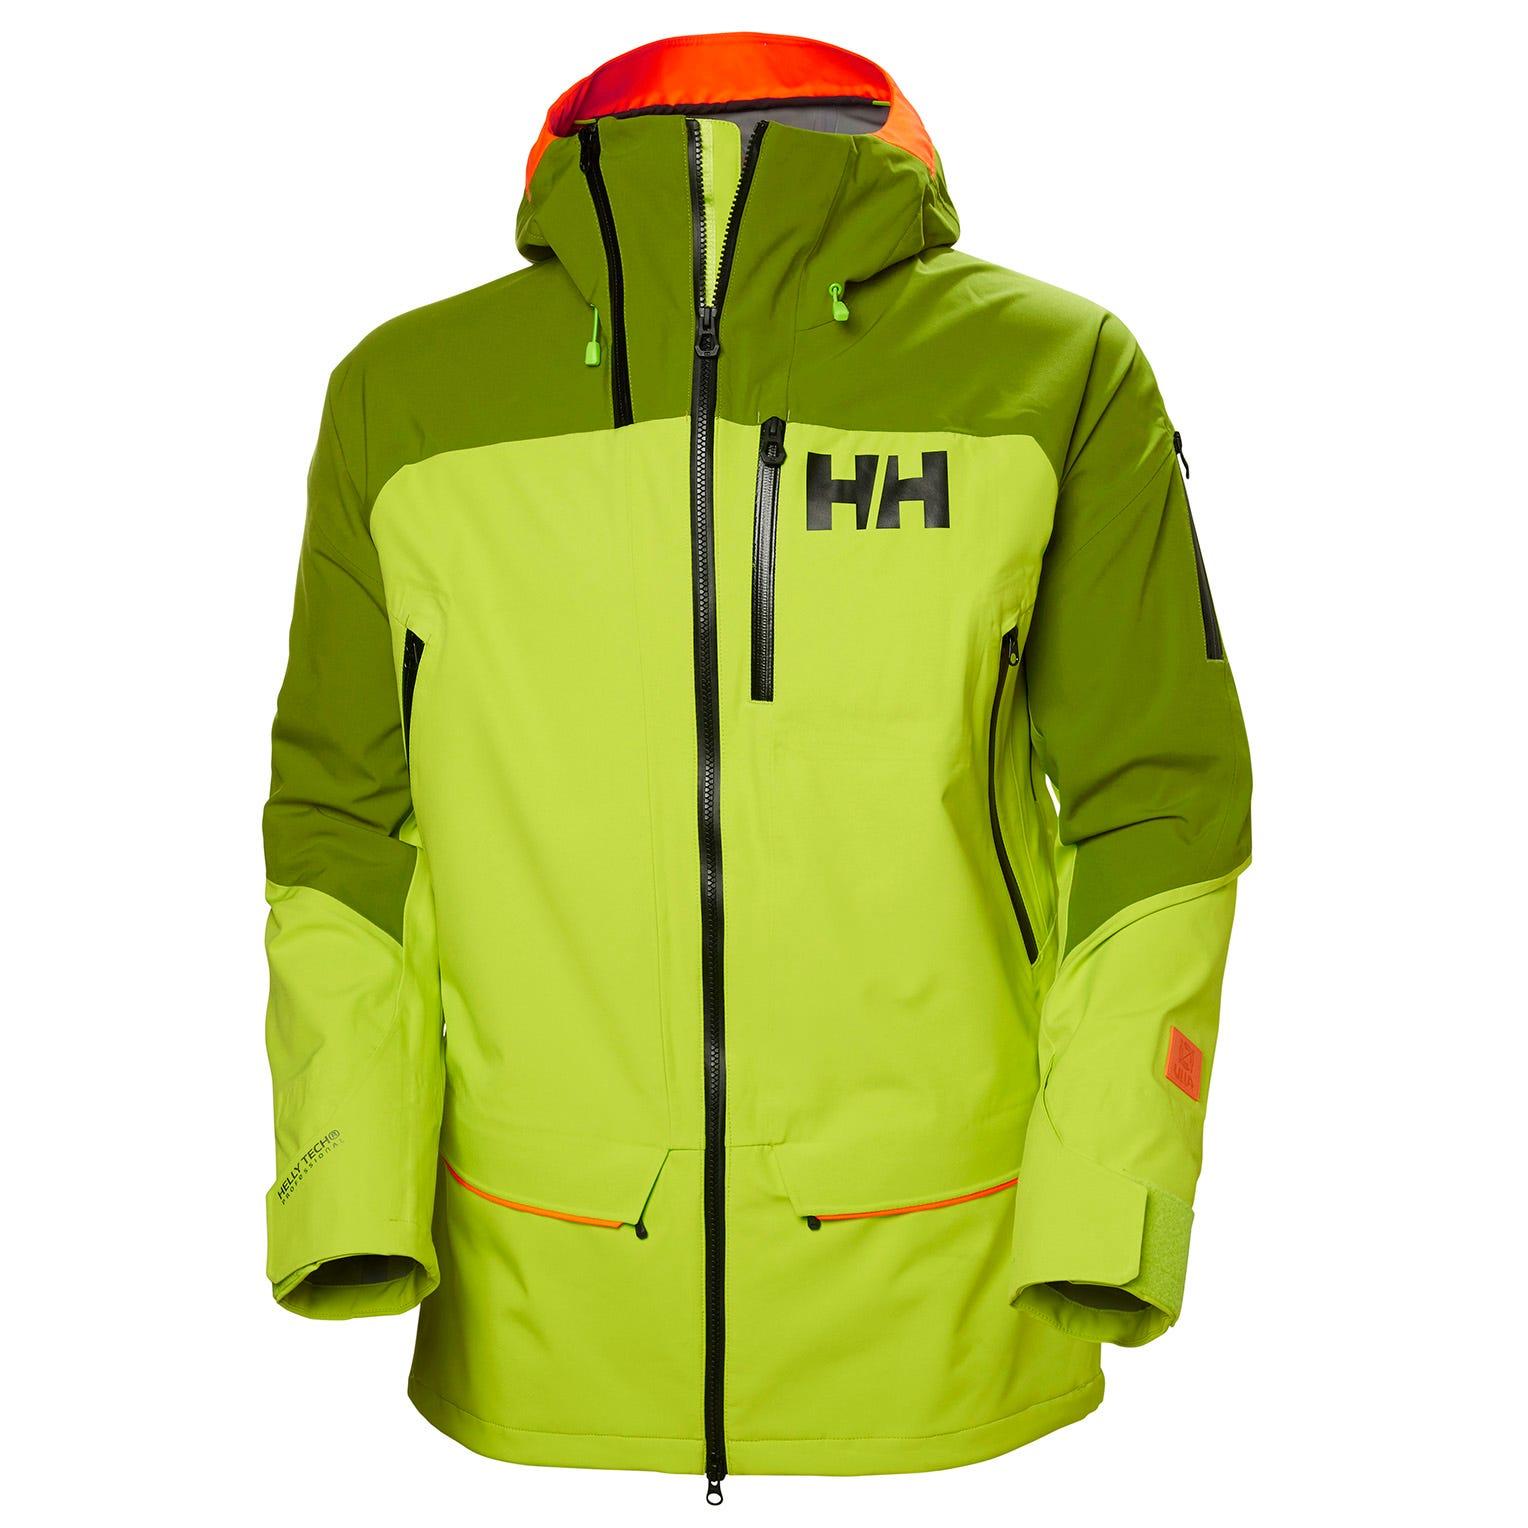 Mens Ridge Shell 2.0 Jacket | Uk Helly Hansen Mens Green XL